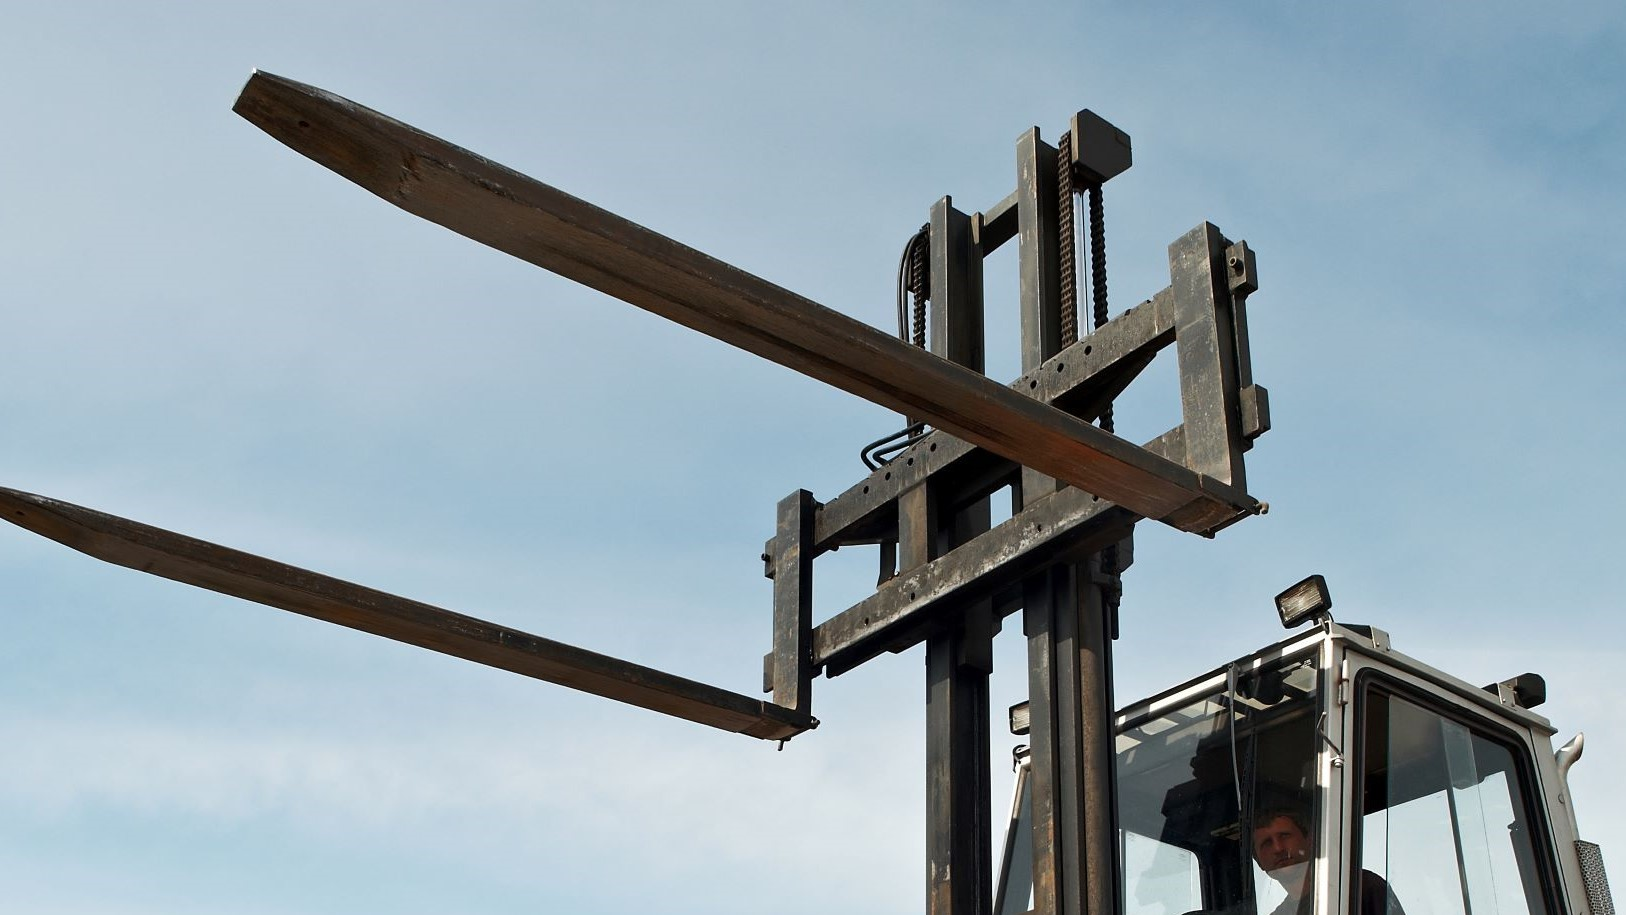 How to Prevent Damage to Forklift Forks